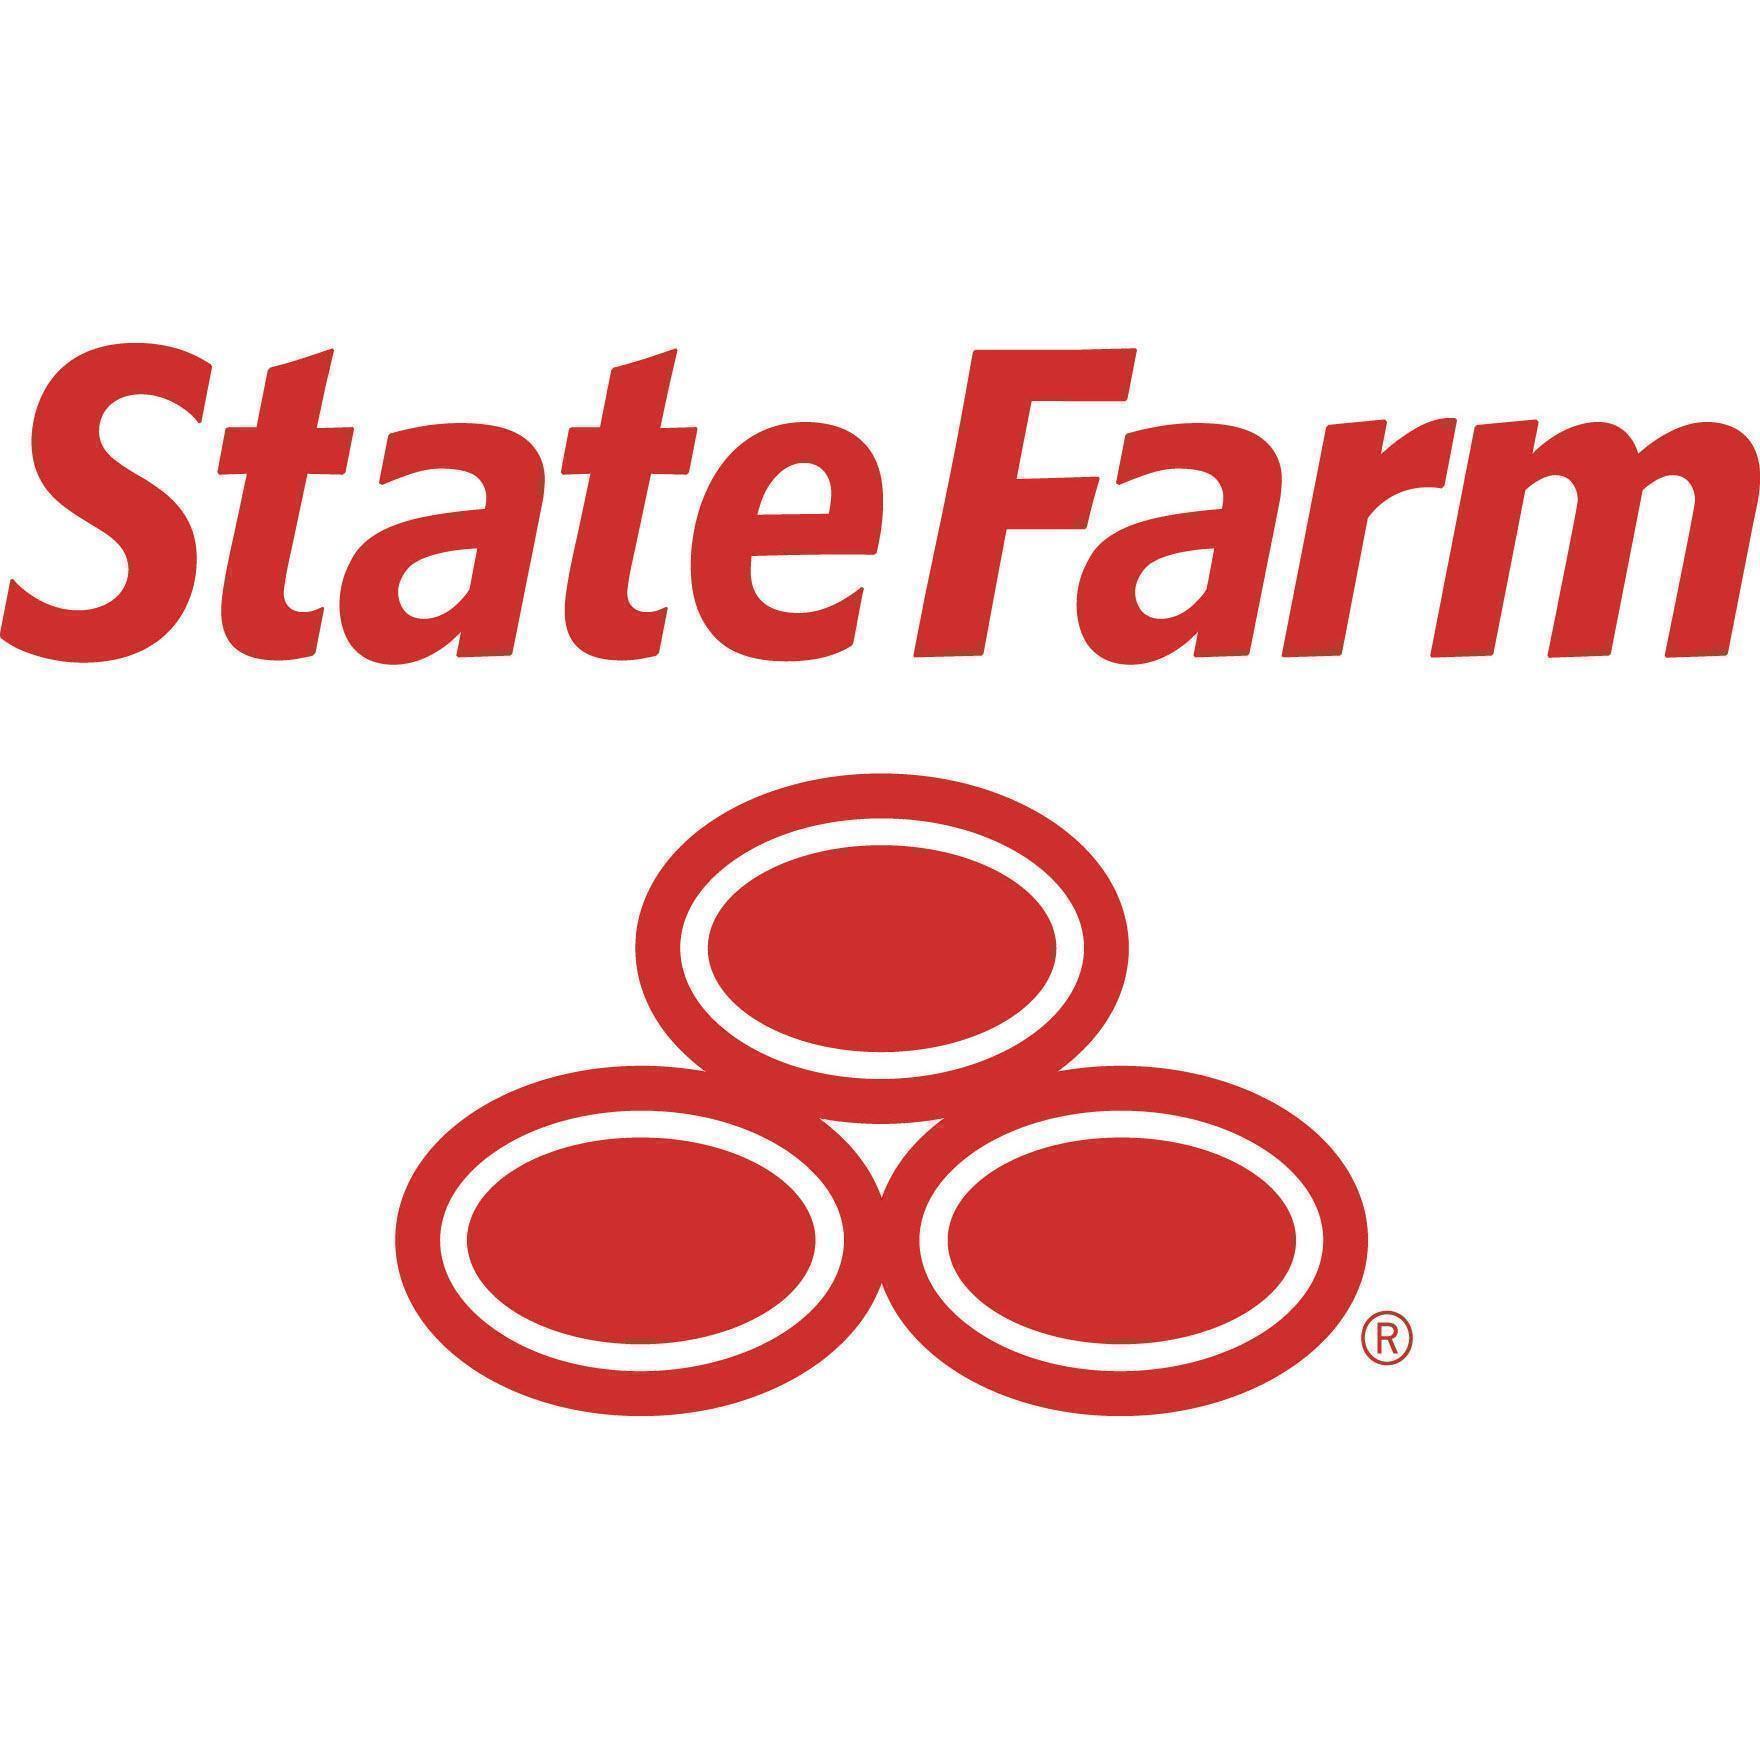 Stephen Spurlock - State Farm Insurance Agent